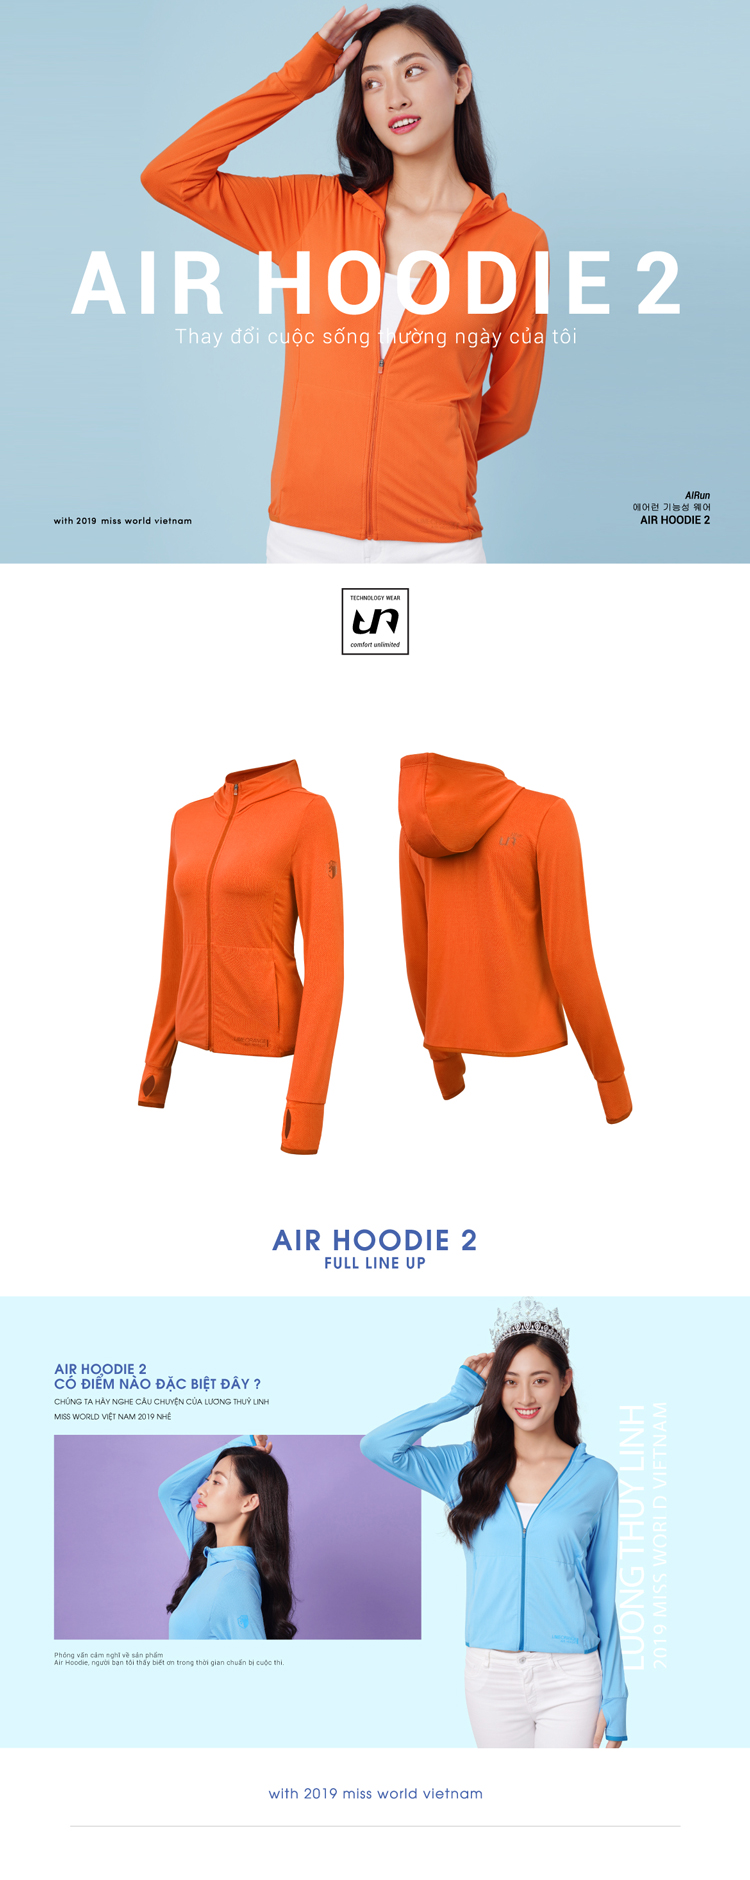 Áo khoác nữ Air Hoodie LO19707101-O 1